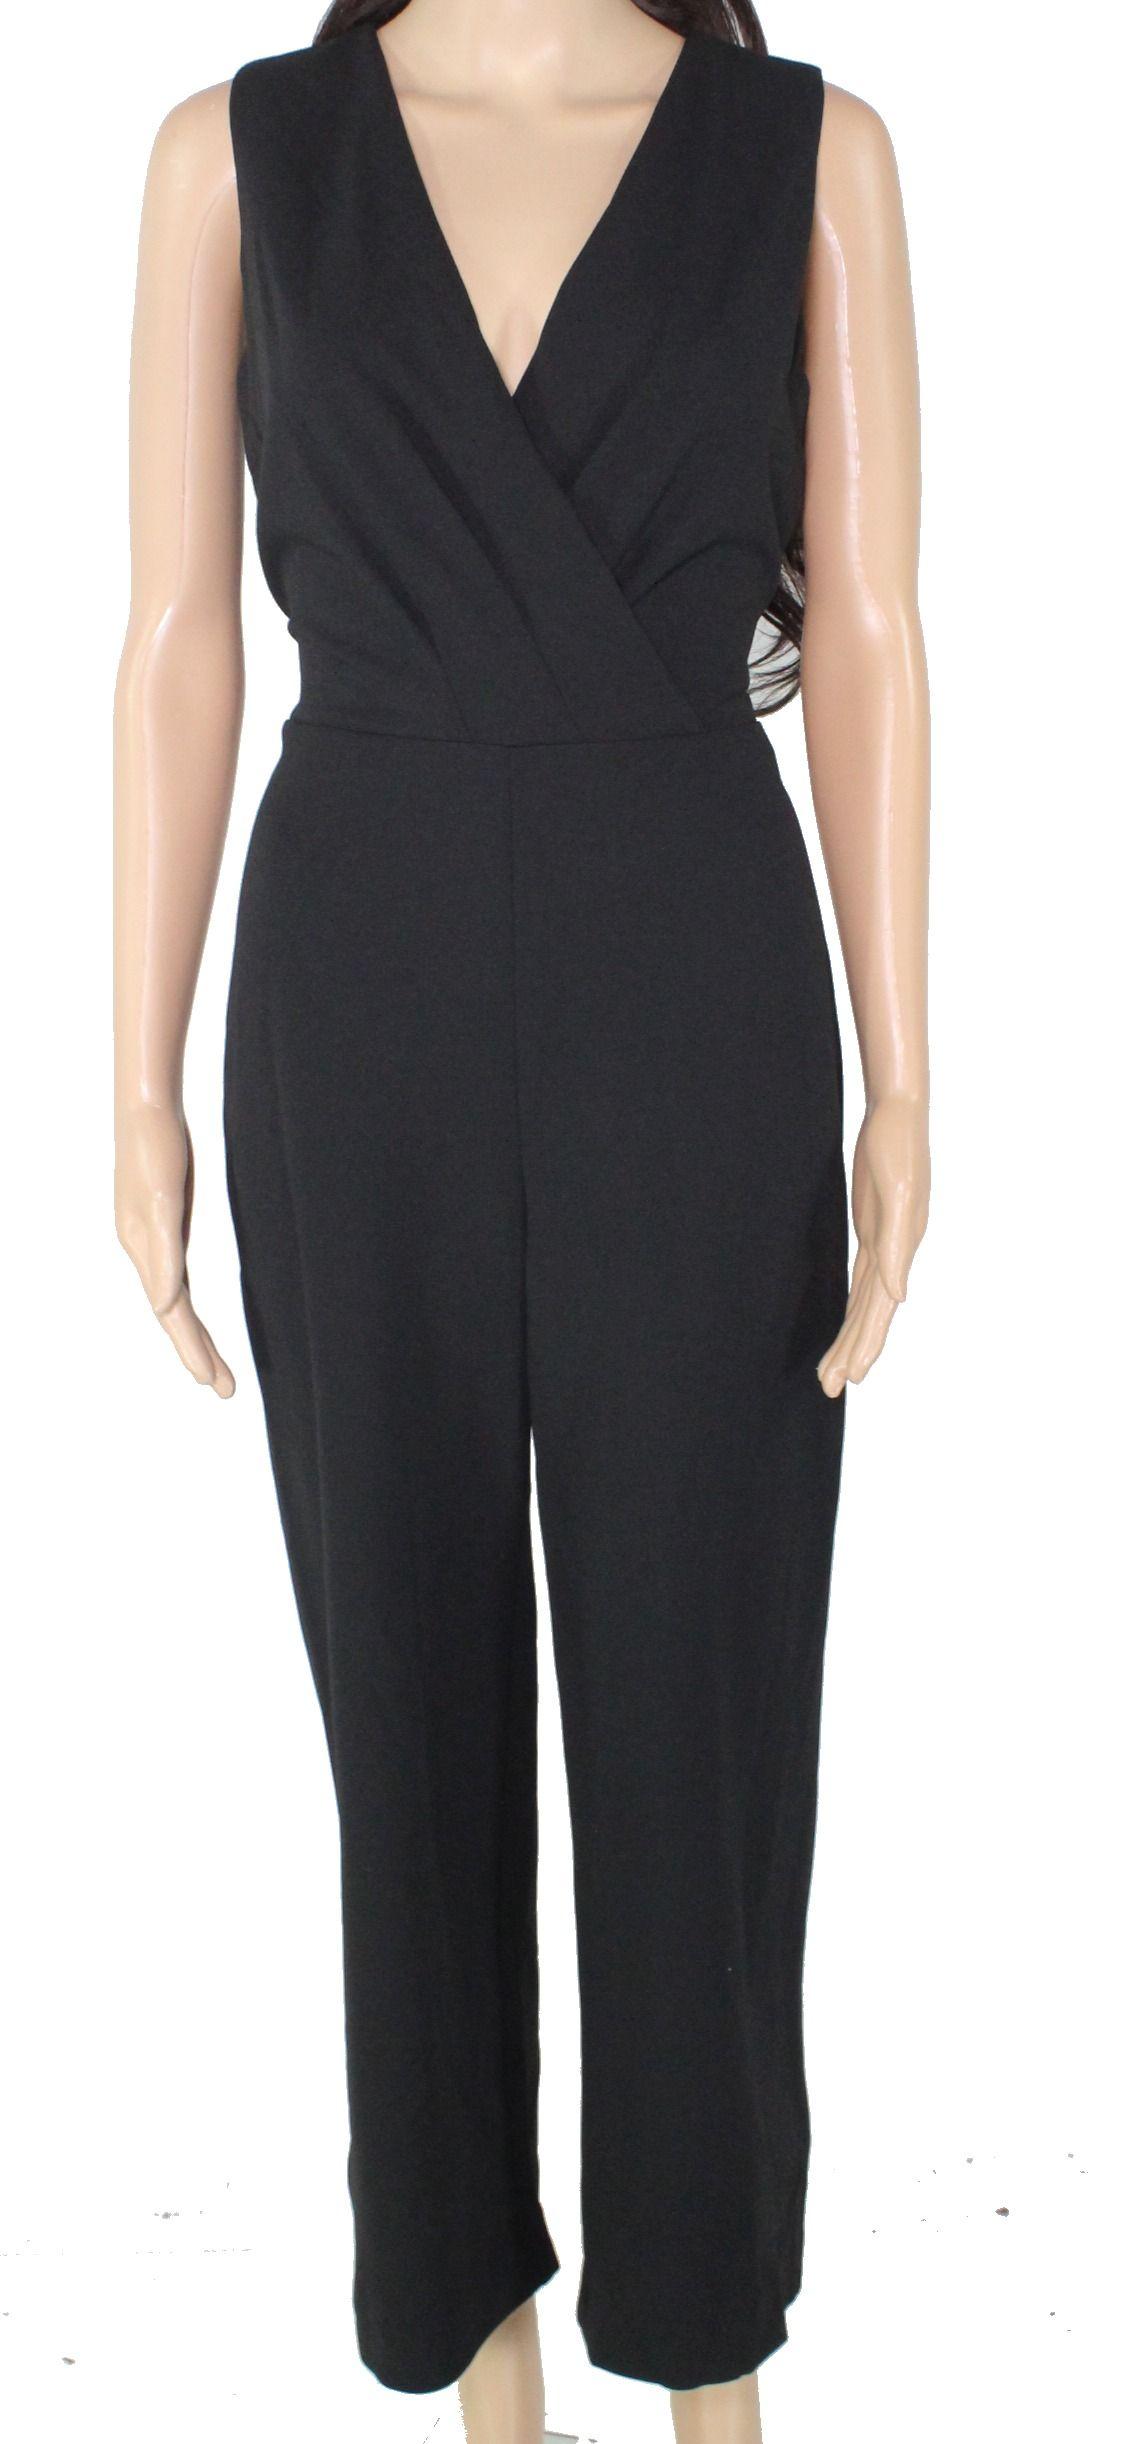 Lauren by Ralph Lauren Women's Jumpsuit Classic Black Size 4 Surplice